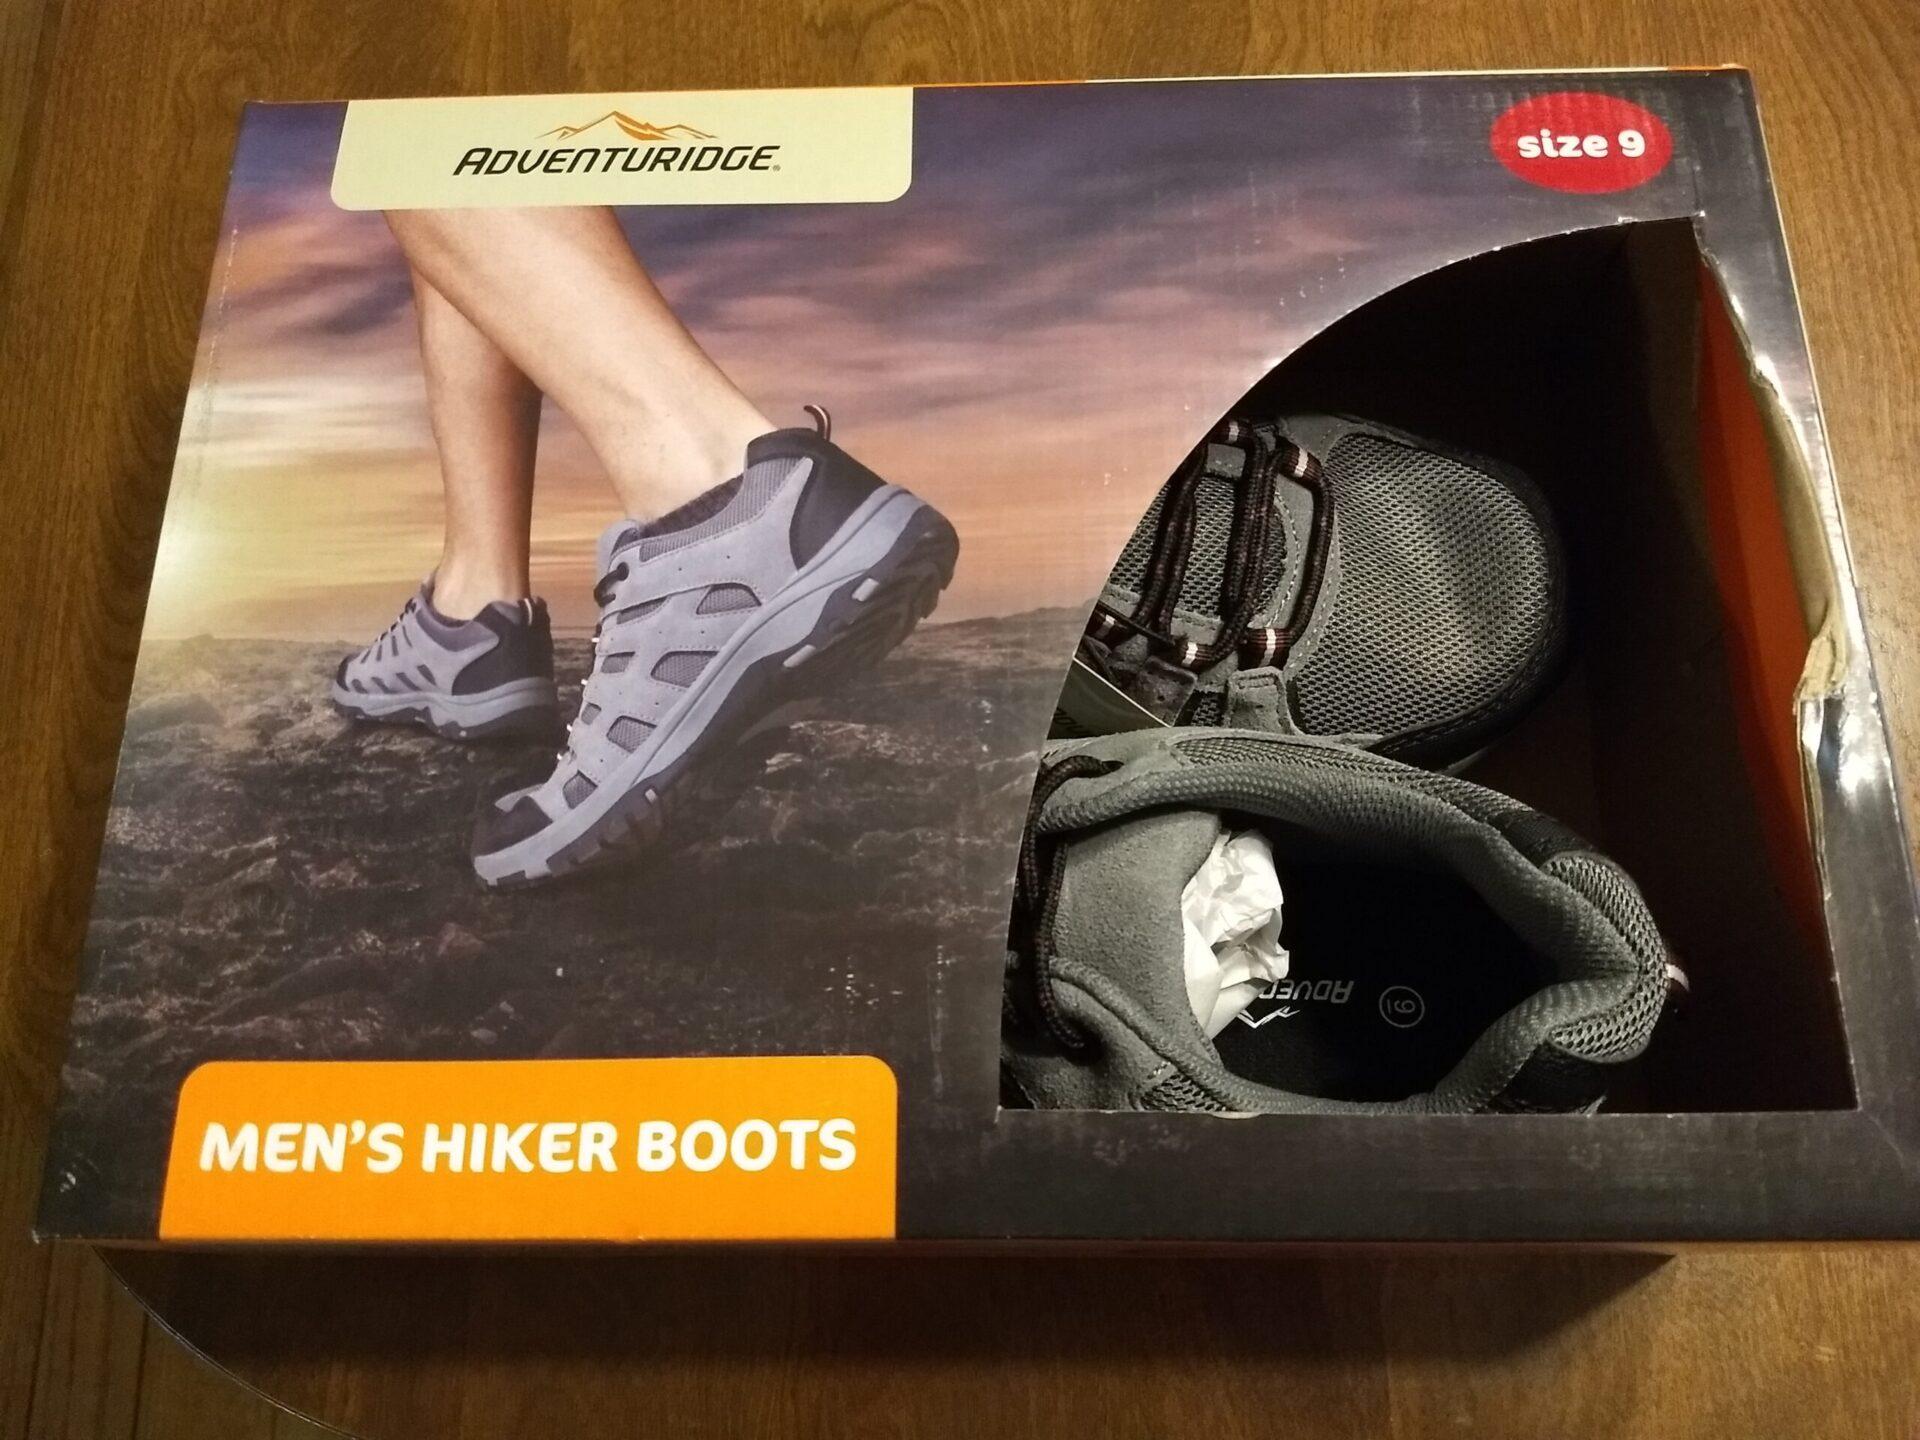 700f5b58002 Adventuridge Men's Hiker Boots | ALDI REVIEWER